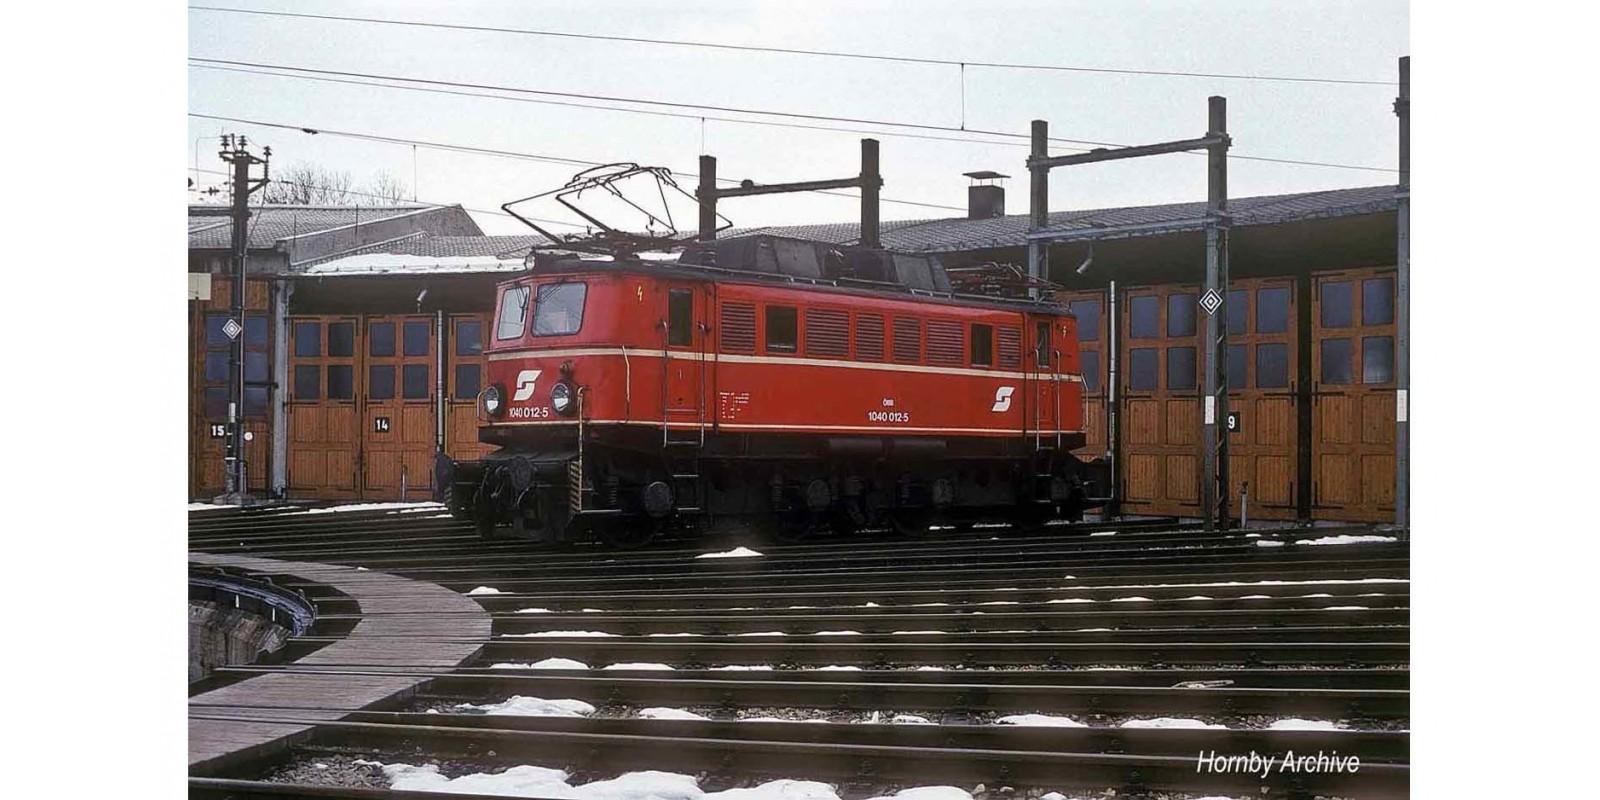 RI2821ACS ÖBB, electric locomotive class 1040, vermillion livery, new logo and markings, period IV-V, with AC Sound Decoder